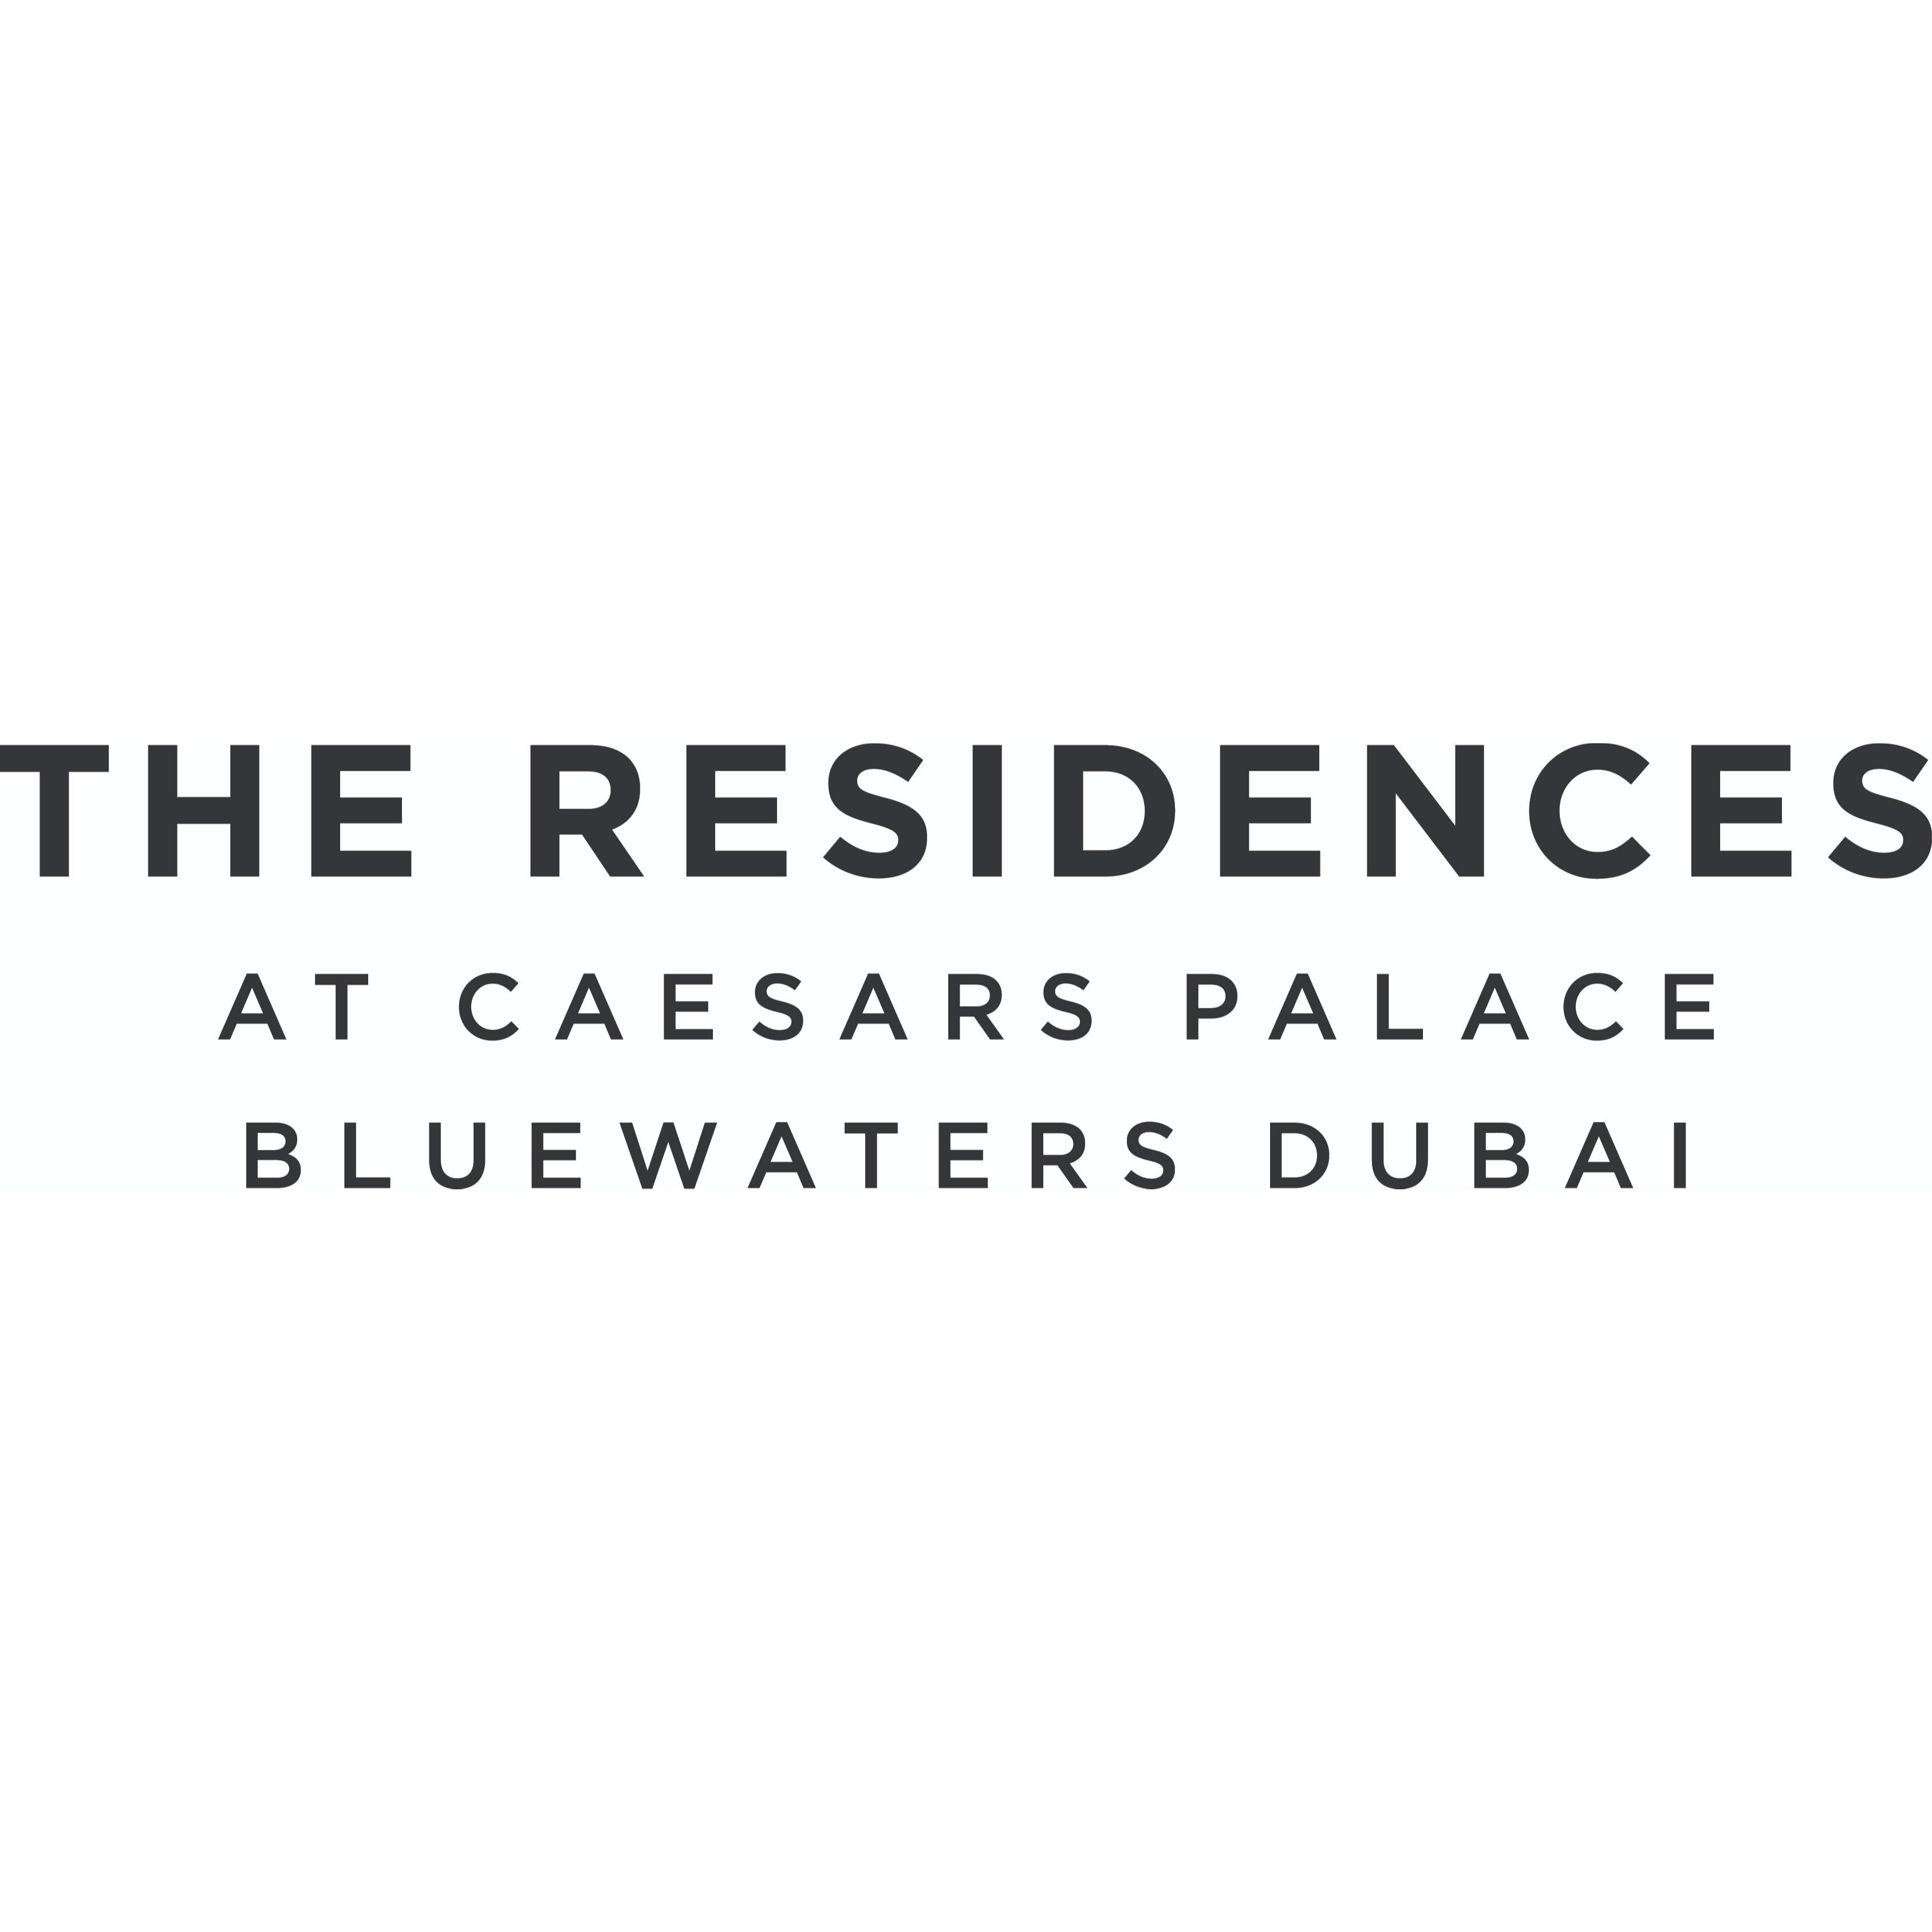 The Residences at Caesars Palace Bluewaters Dubai